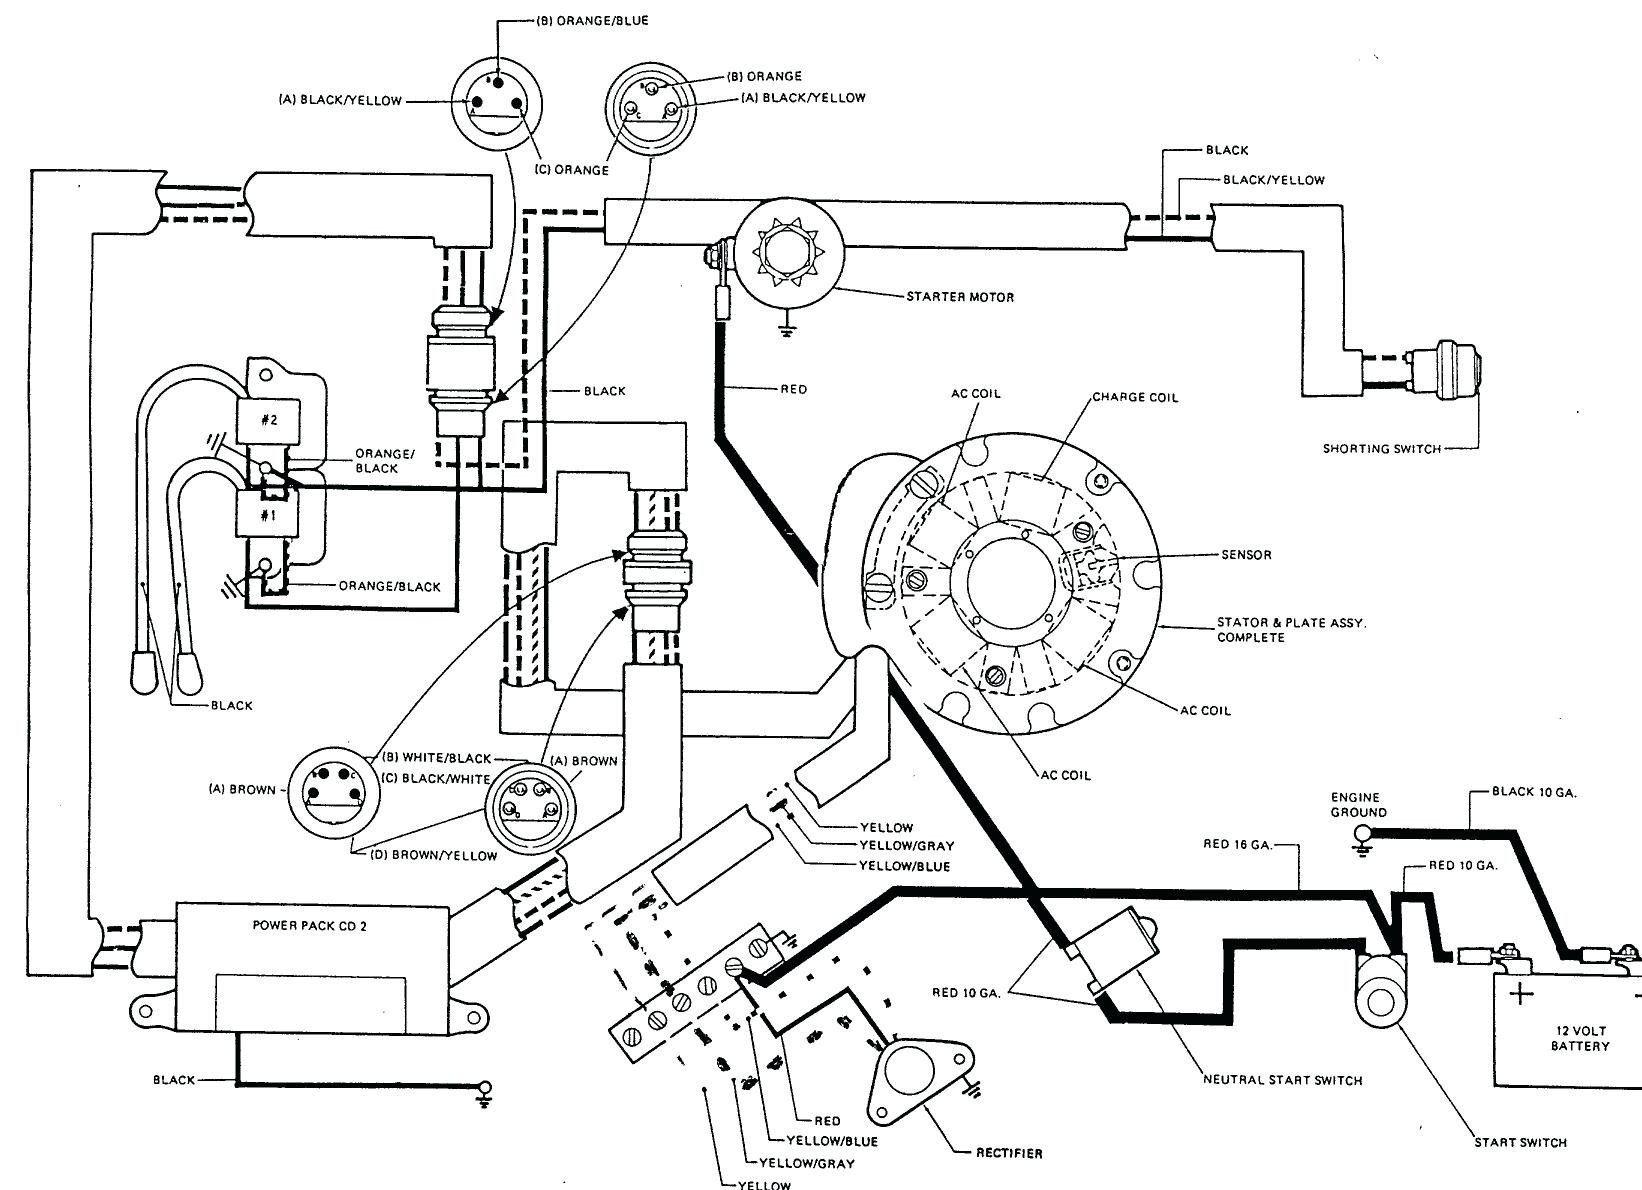 Holley Electric Choke Wiring Diagram In